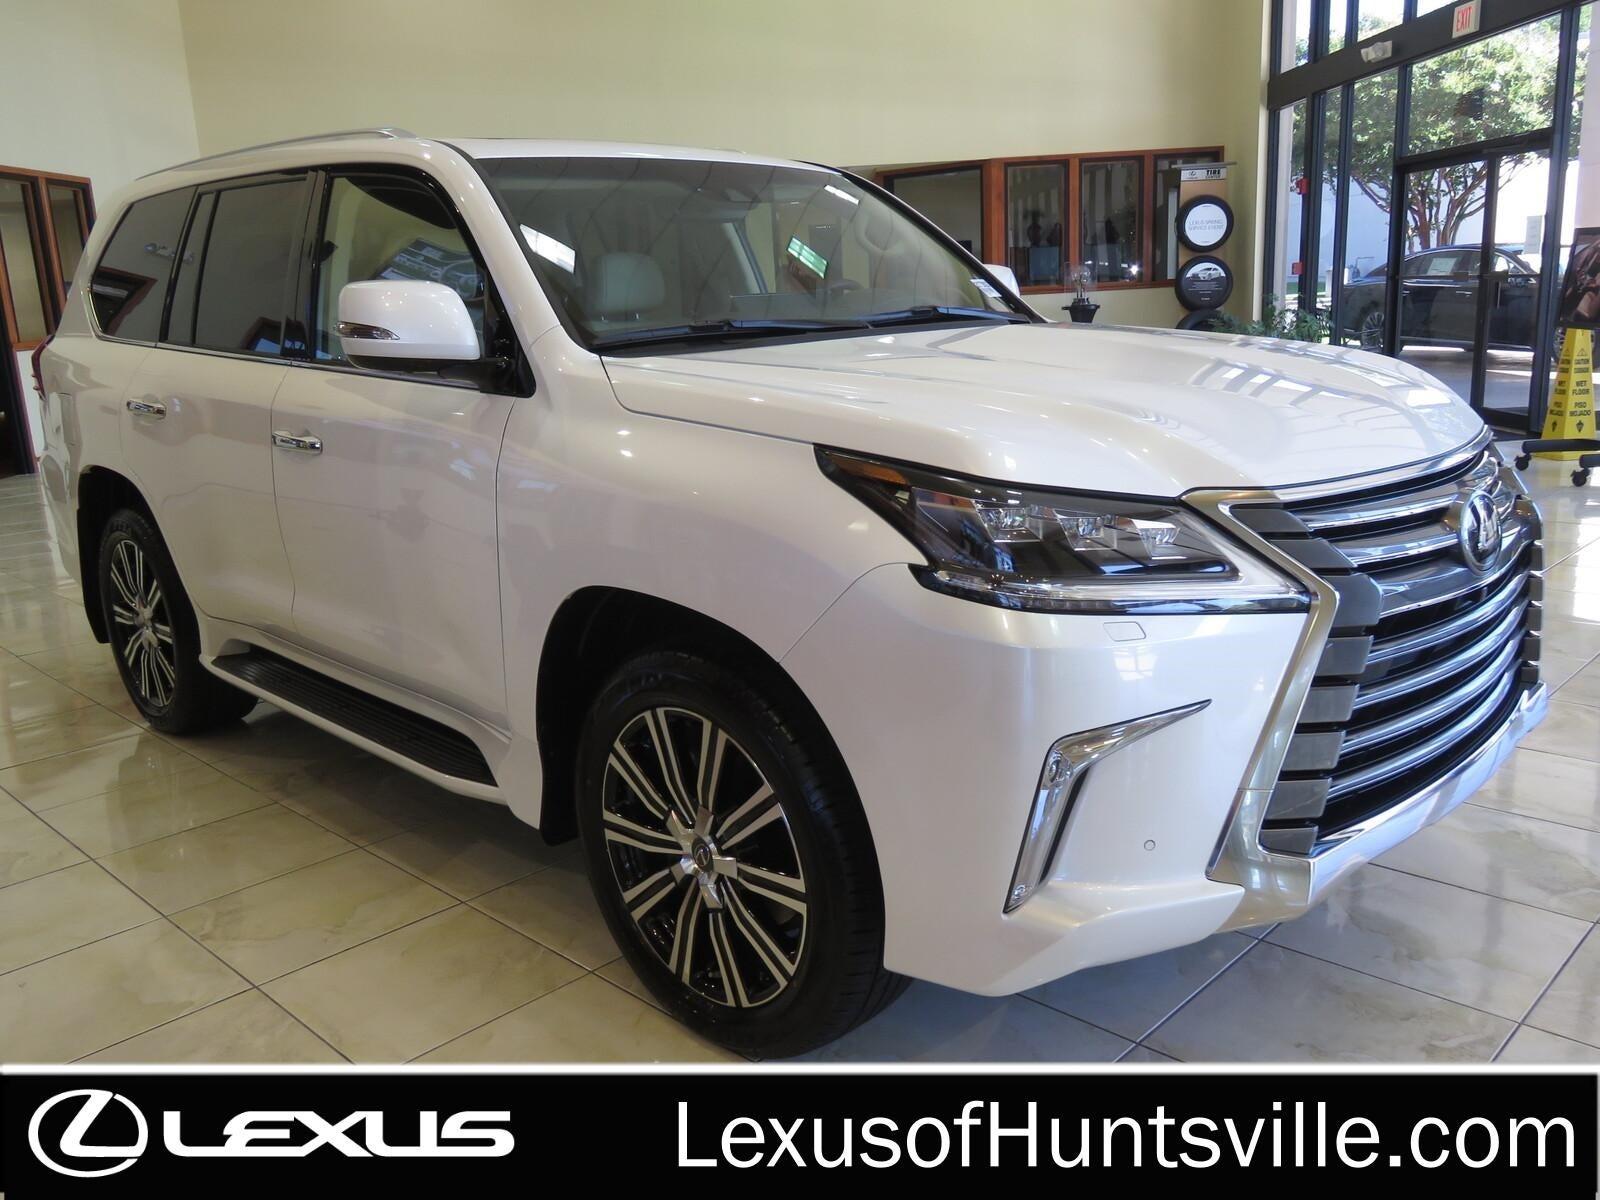 2021 Lexus LX 570 Huntsville AL